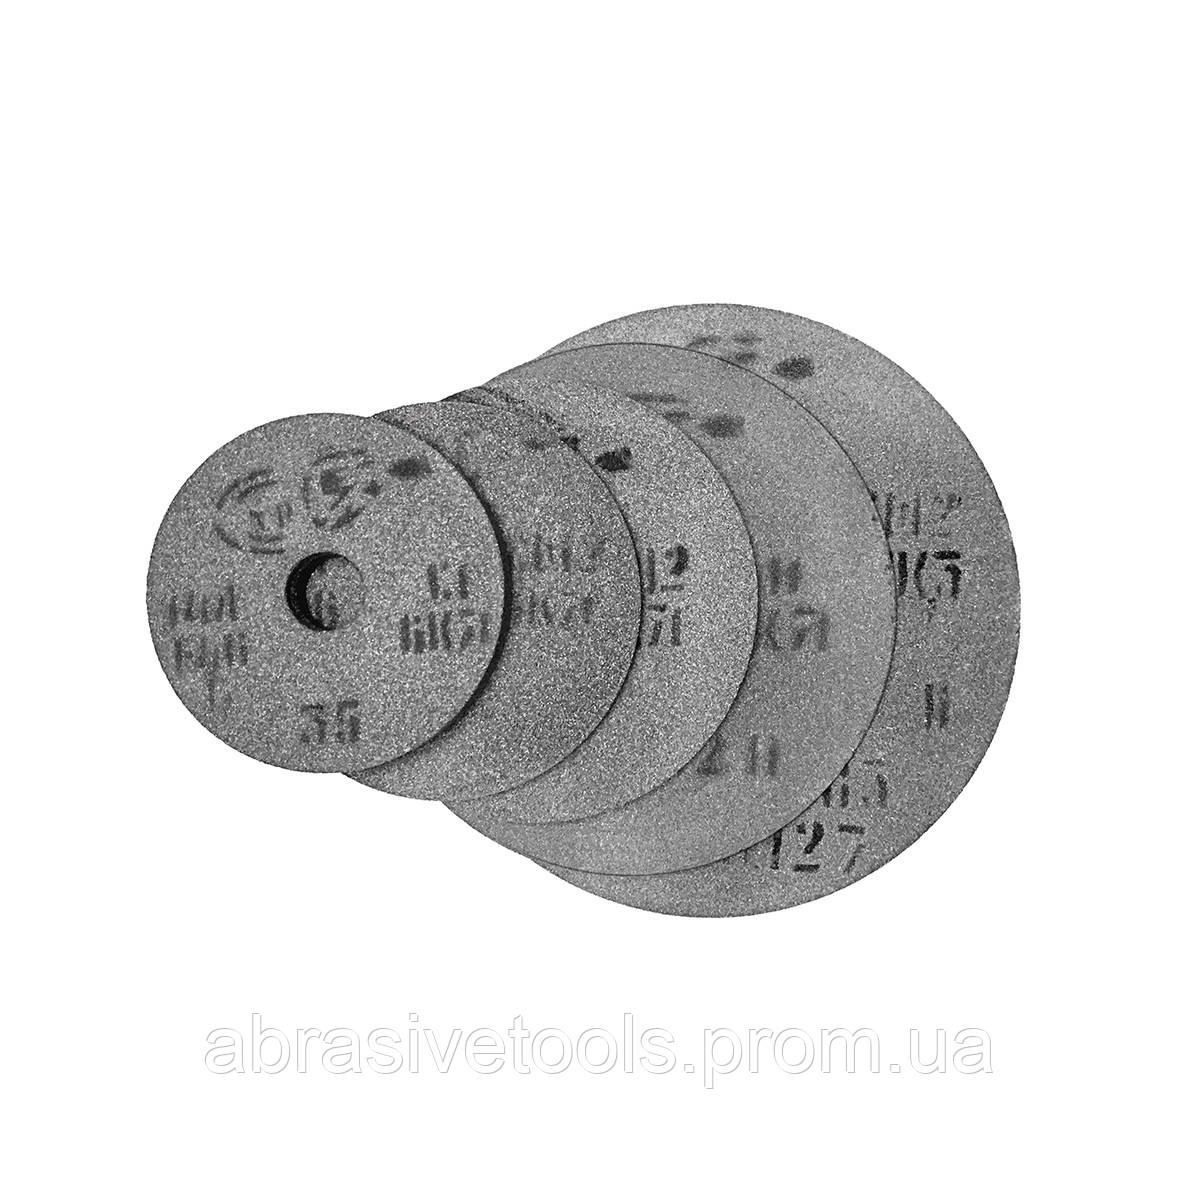 Круг шлифовальный 300х40х127  F46 СМ2